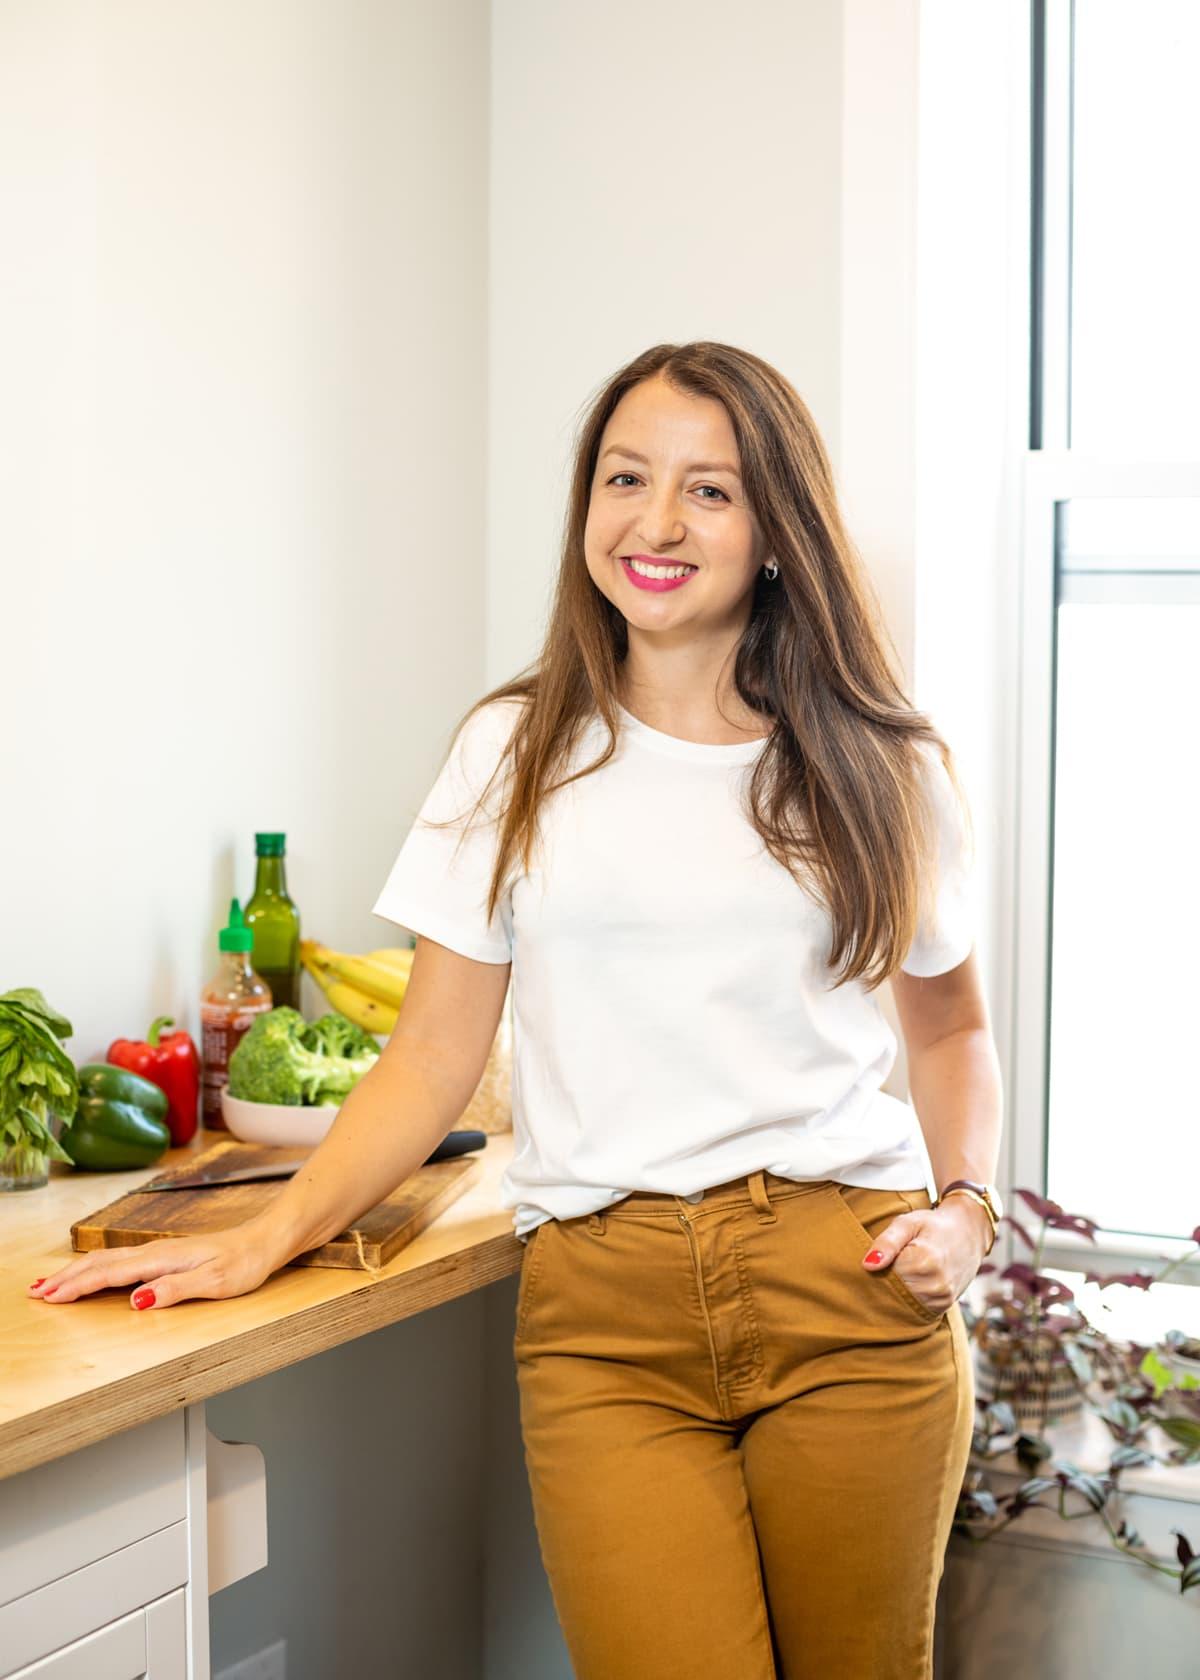 Alexandra Shytsman, creator of The New Baguette. Photo by Lanna Apisukh.